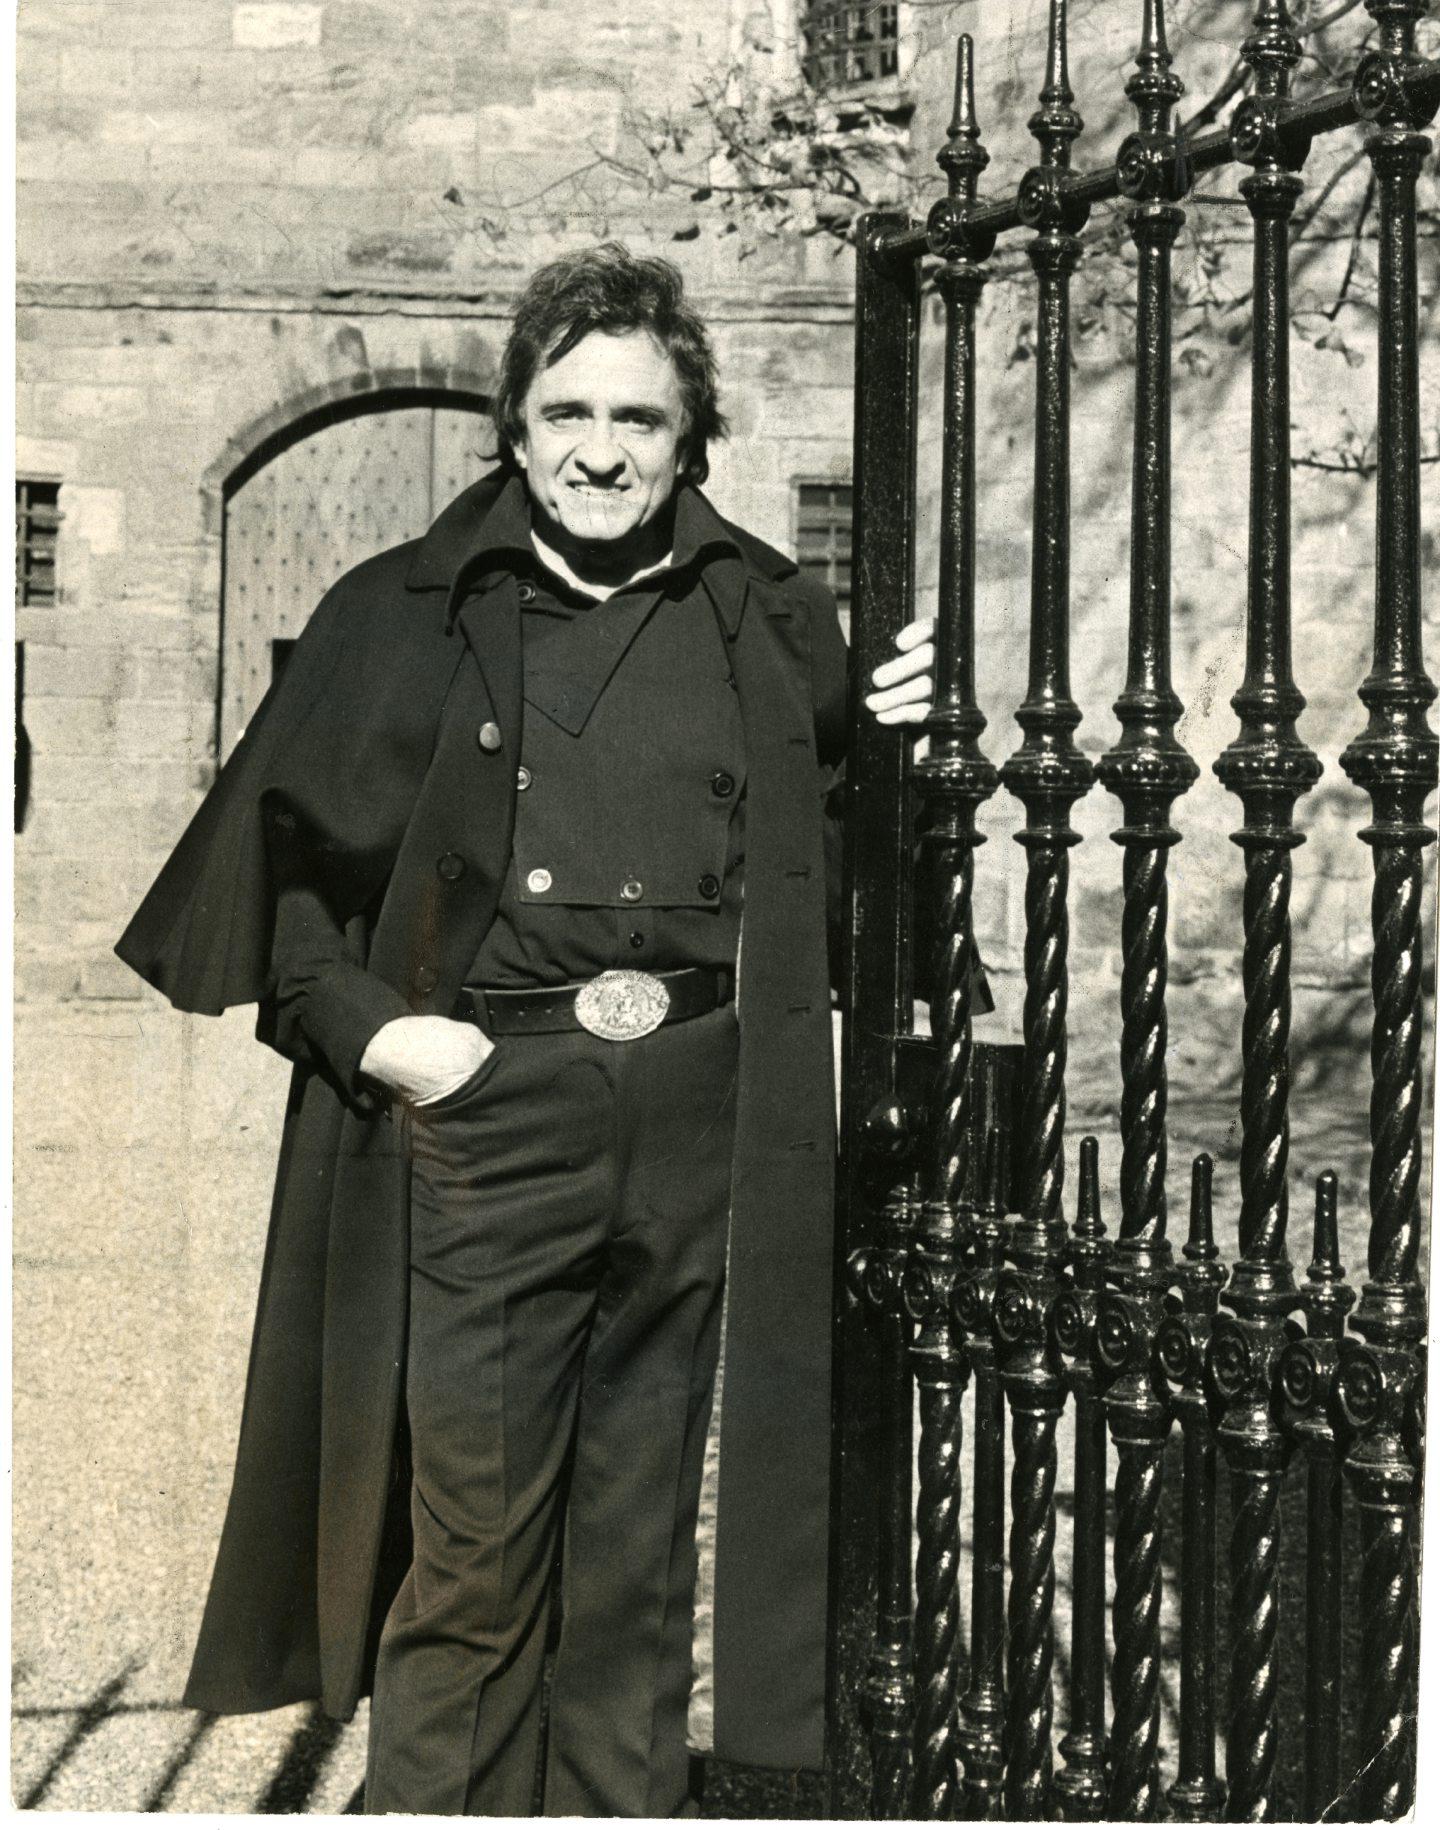 Johnny Cash at Falkland Palace, Fife, in October 1981.